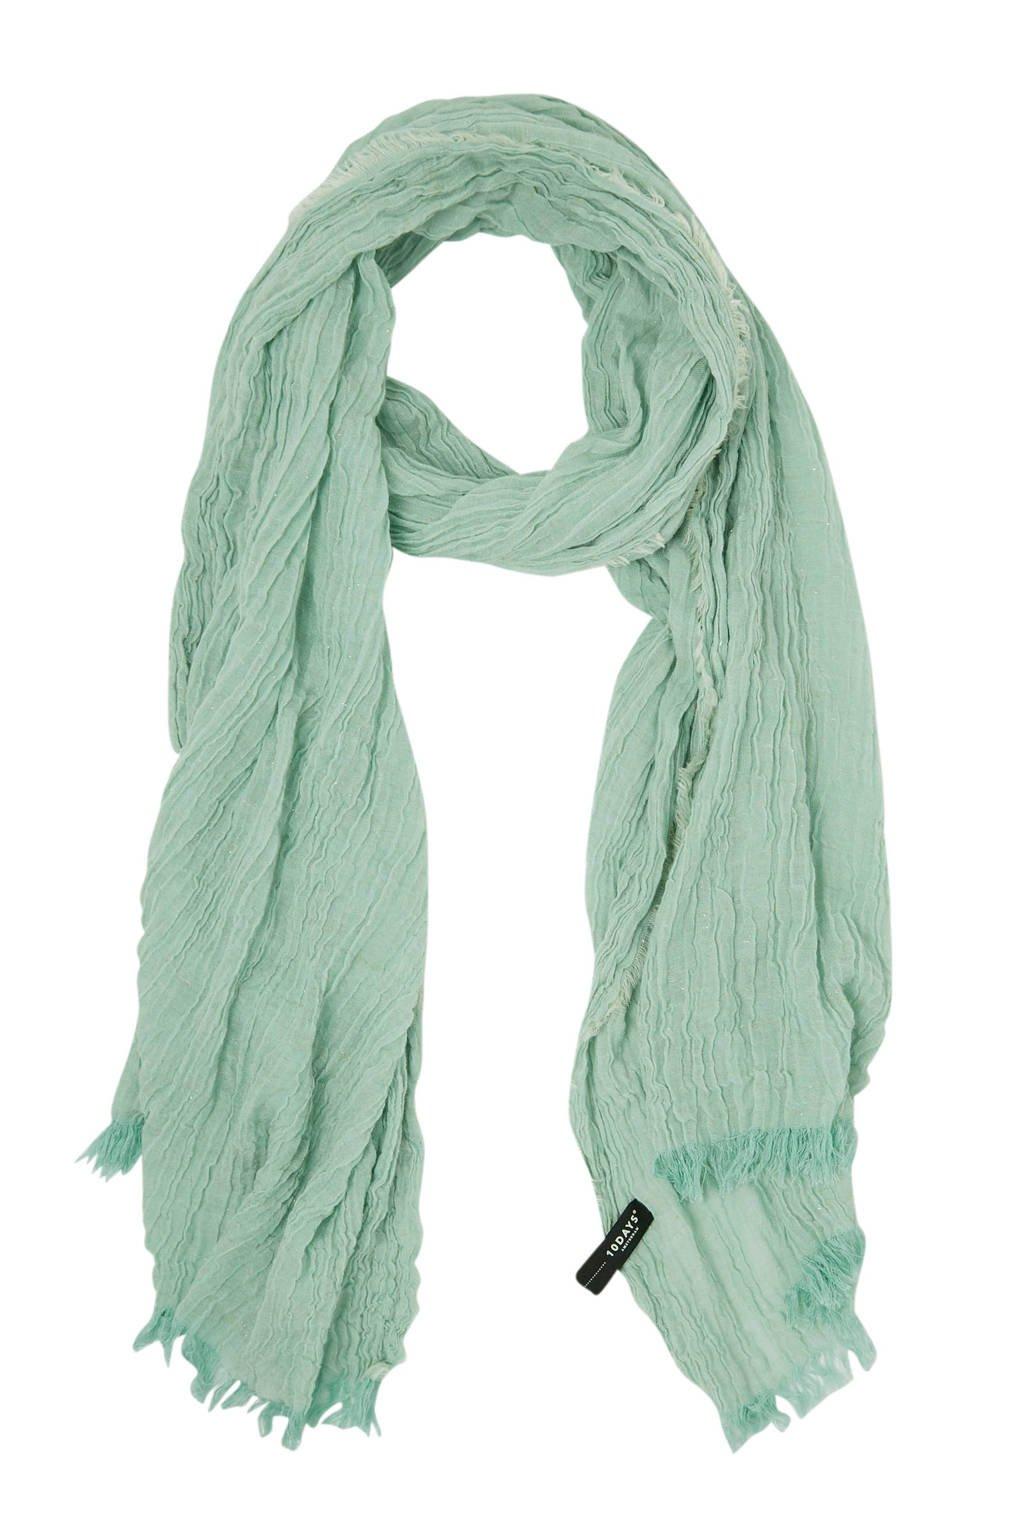 10DAYS lurex sjaal mintgroen, Mintgroen